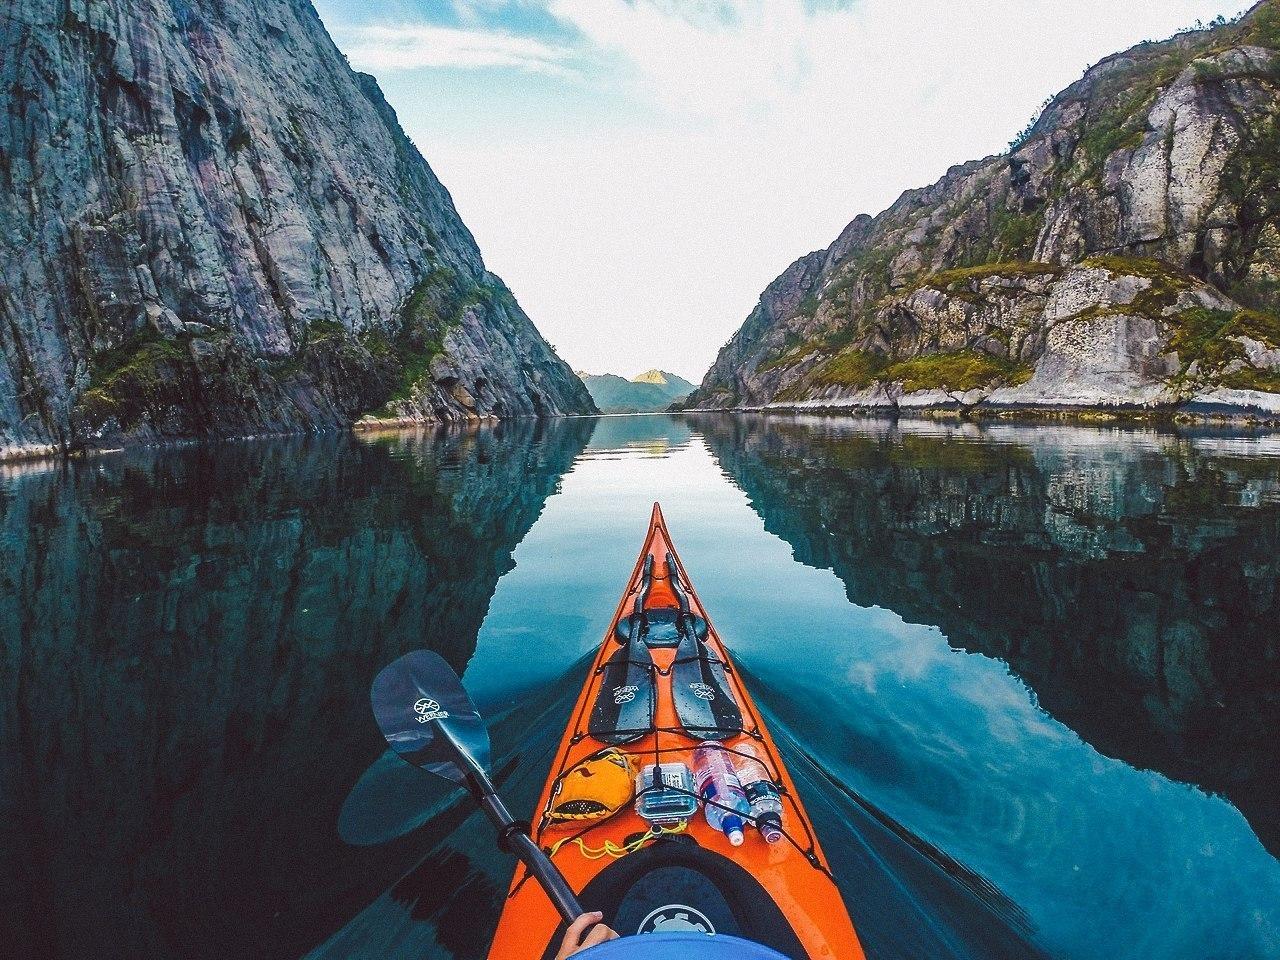 BmyuyapTP6w - Норвегия - страна холодной красоты